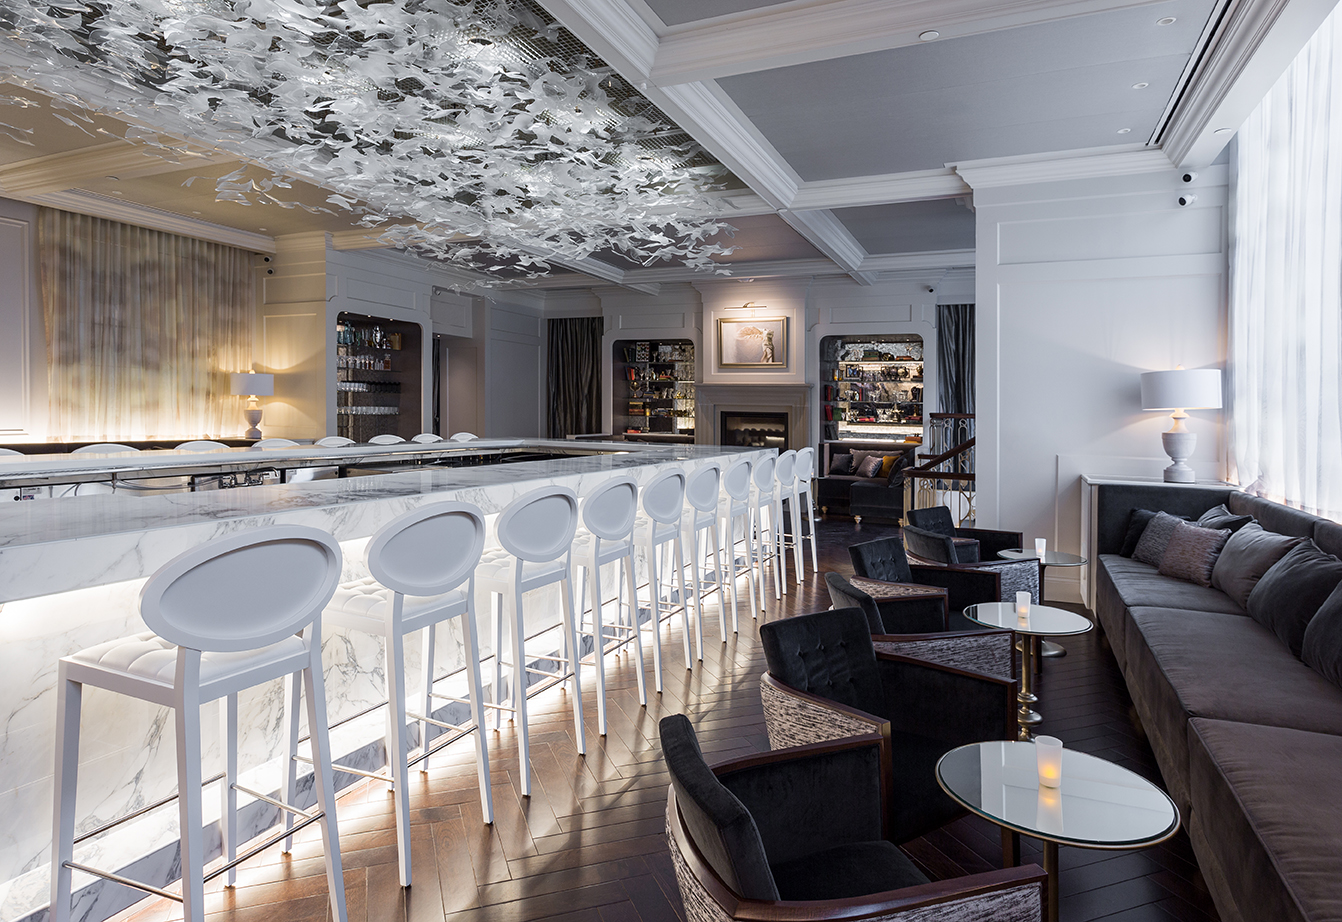 The Monarch Bar